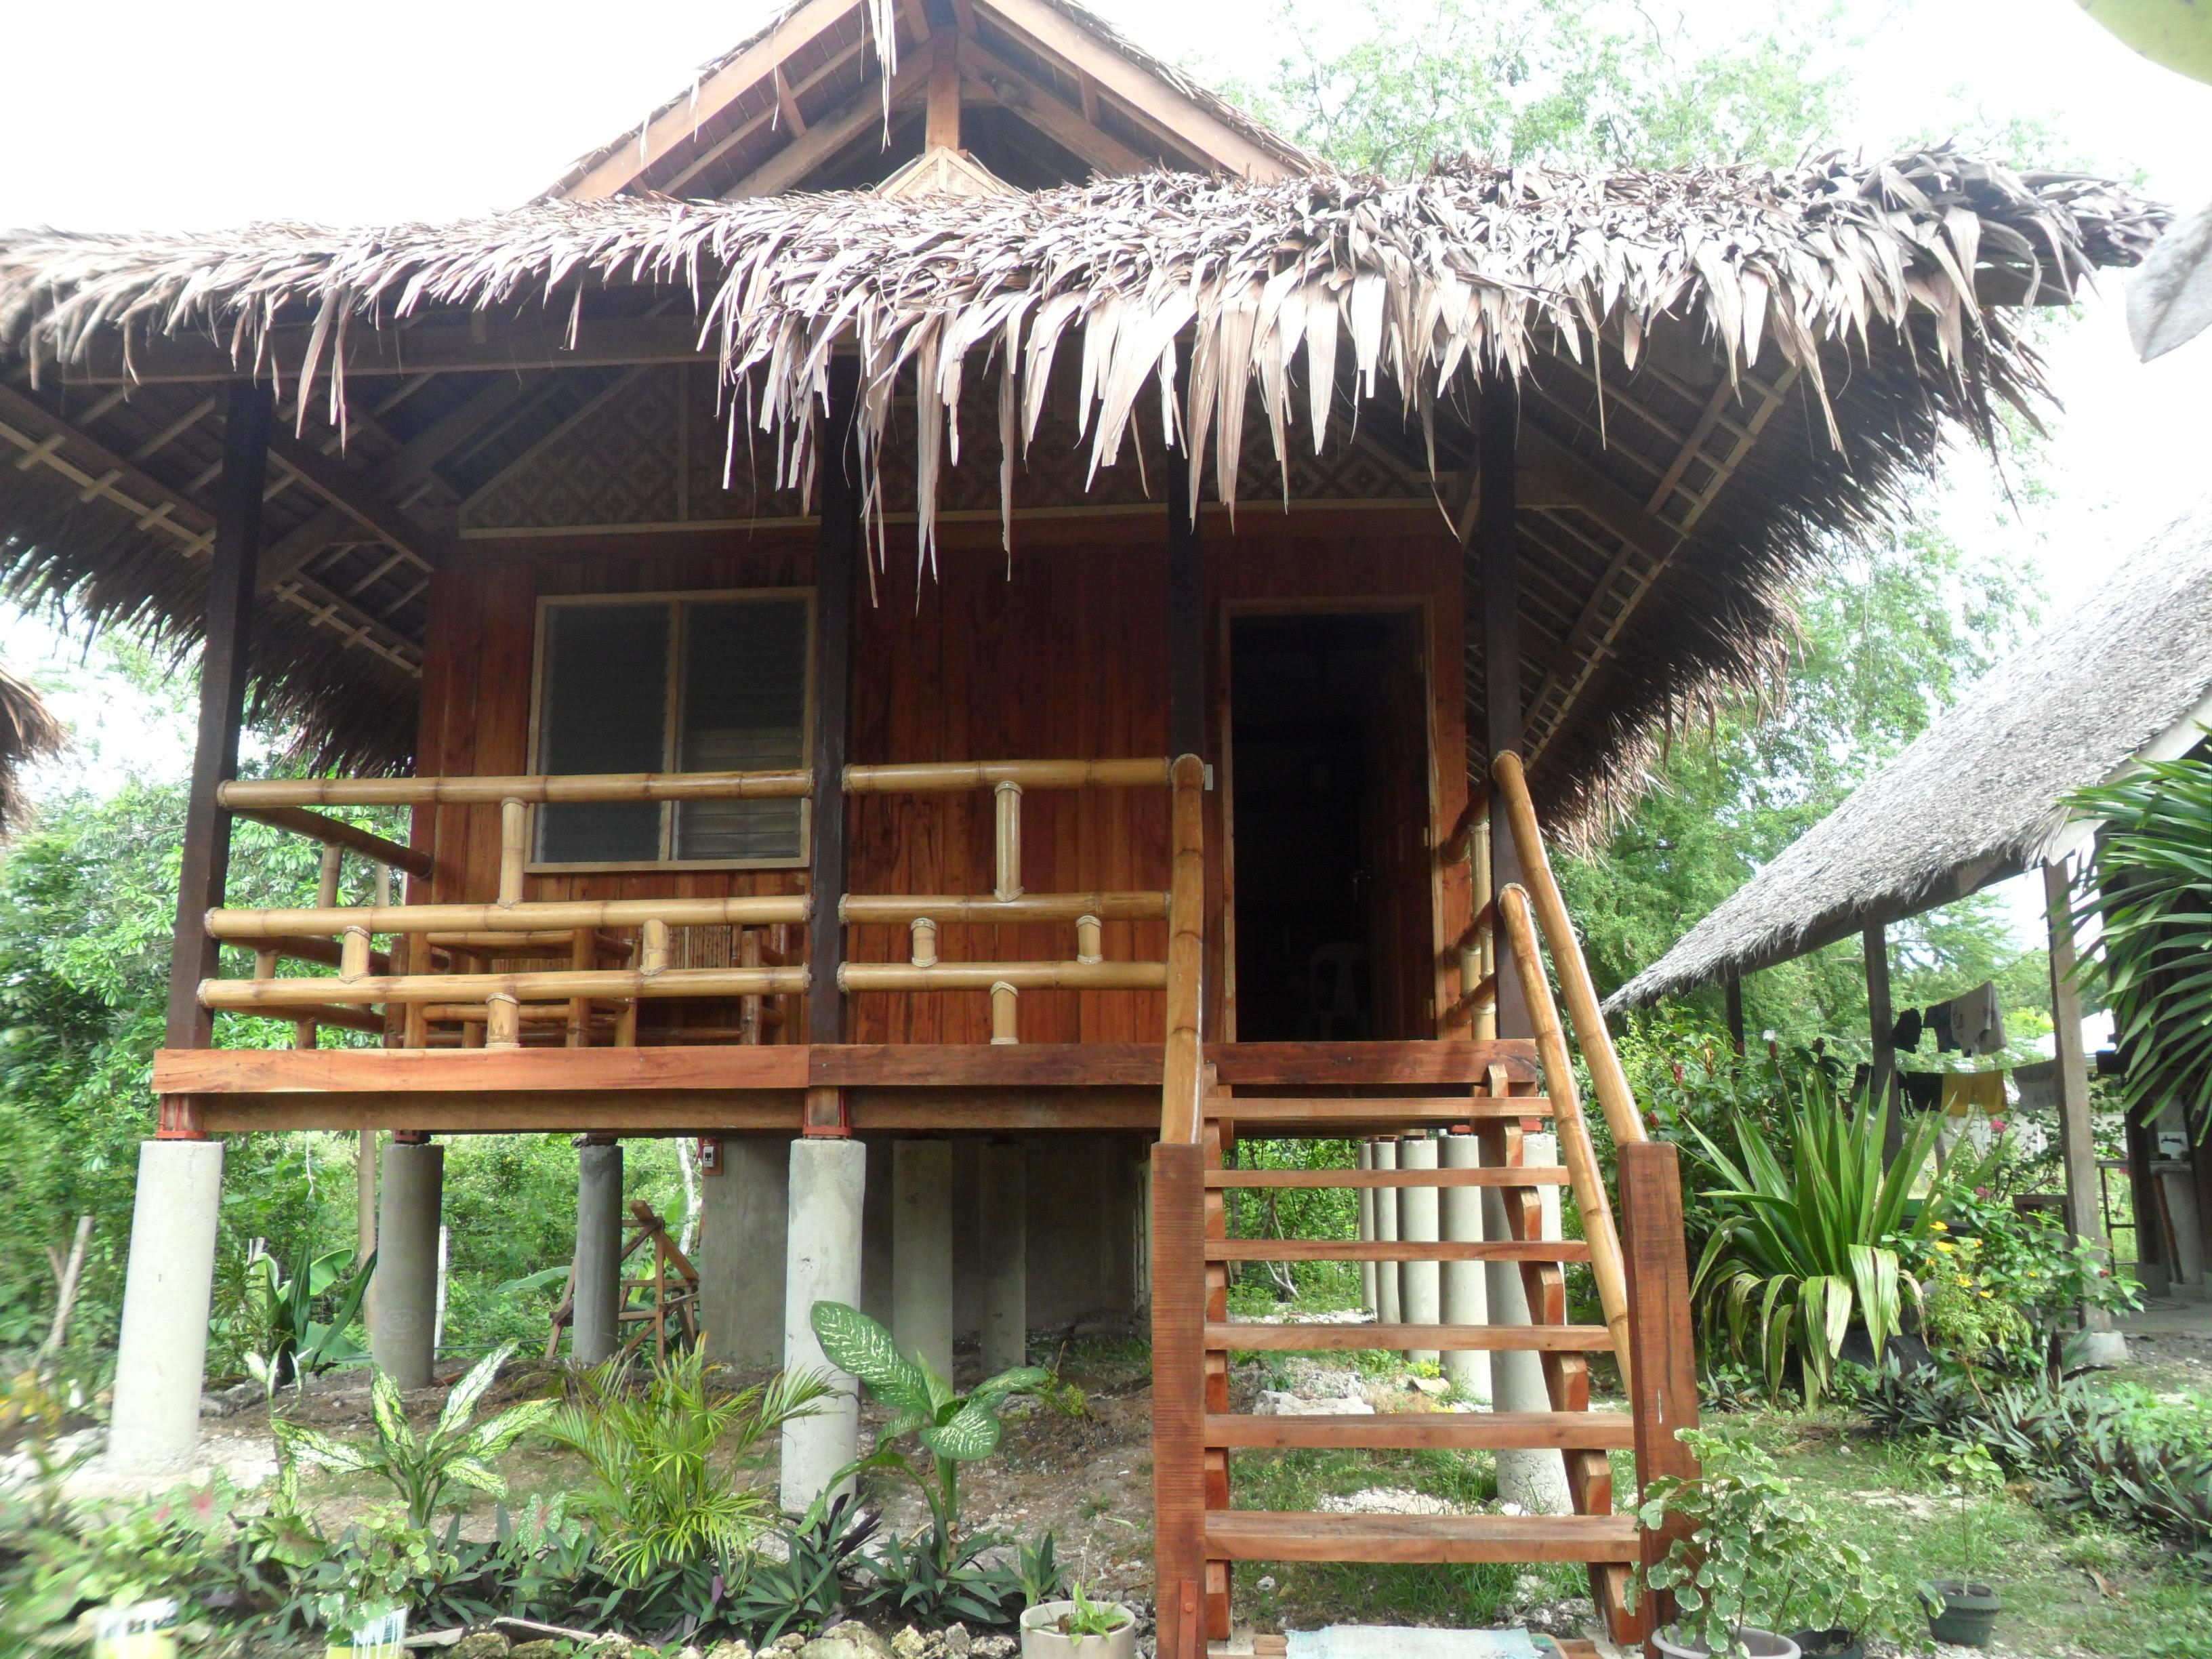 Native Bungalow House Design Philippines   Interior Design on native philippine furniture, native philippine bedroom, native philippine art,